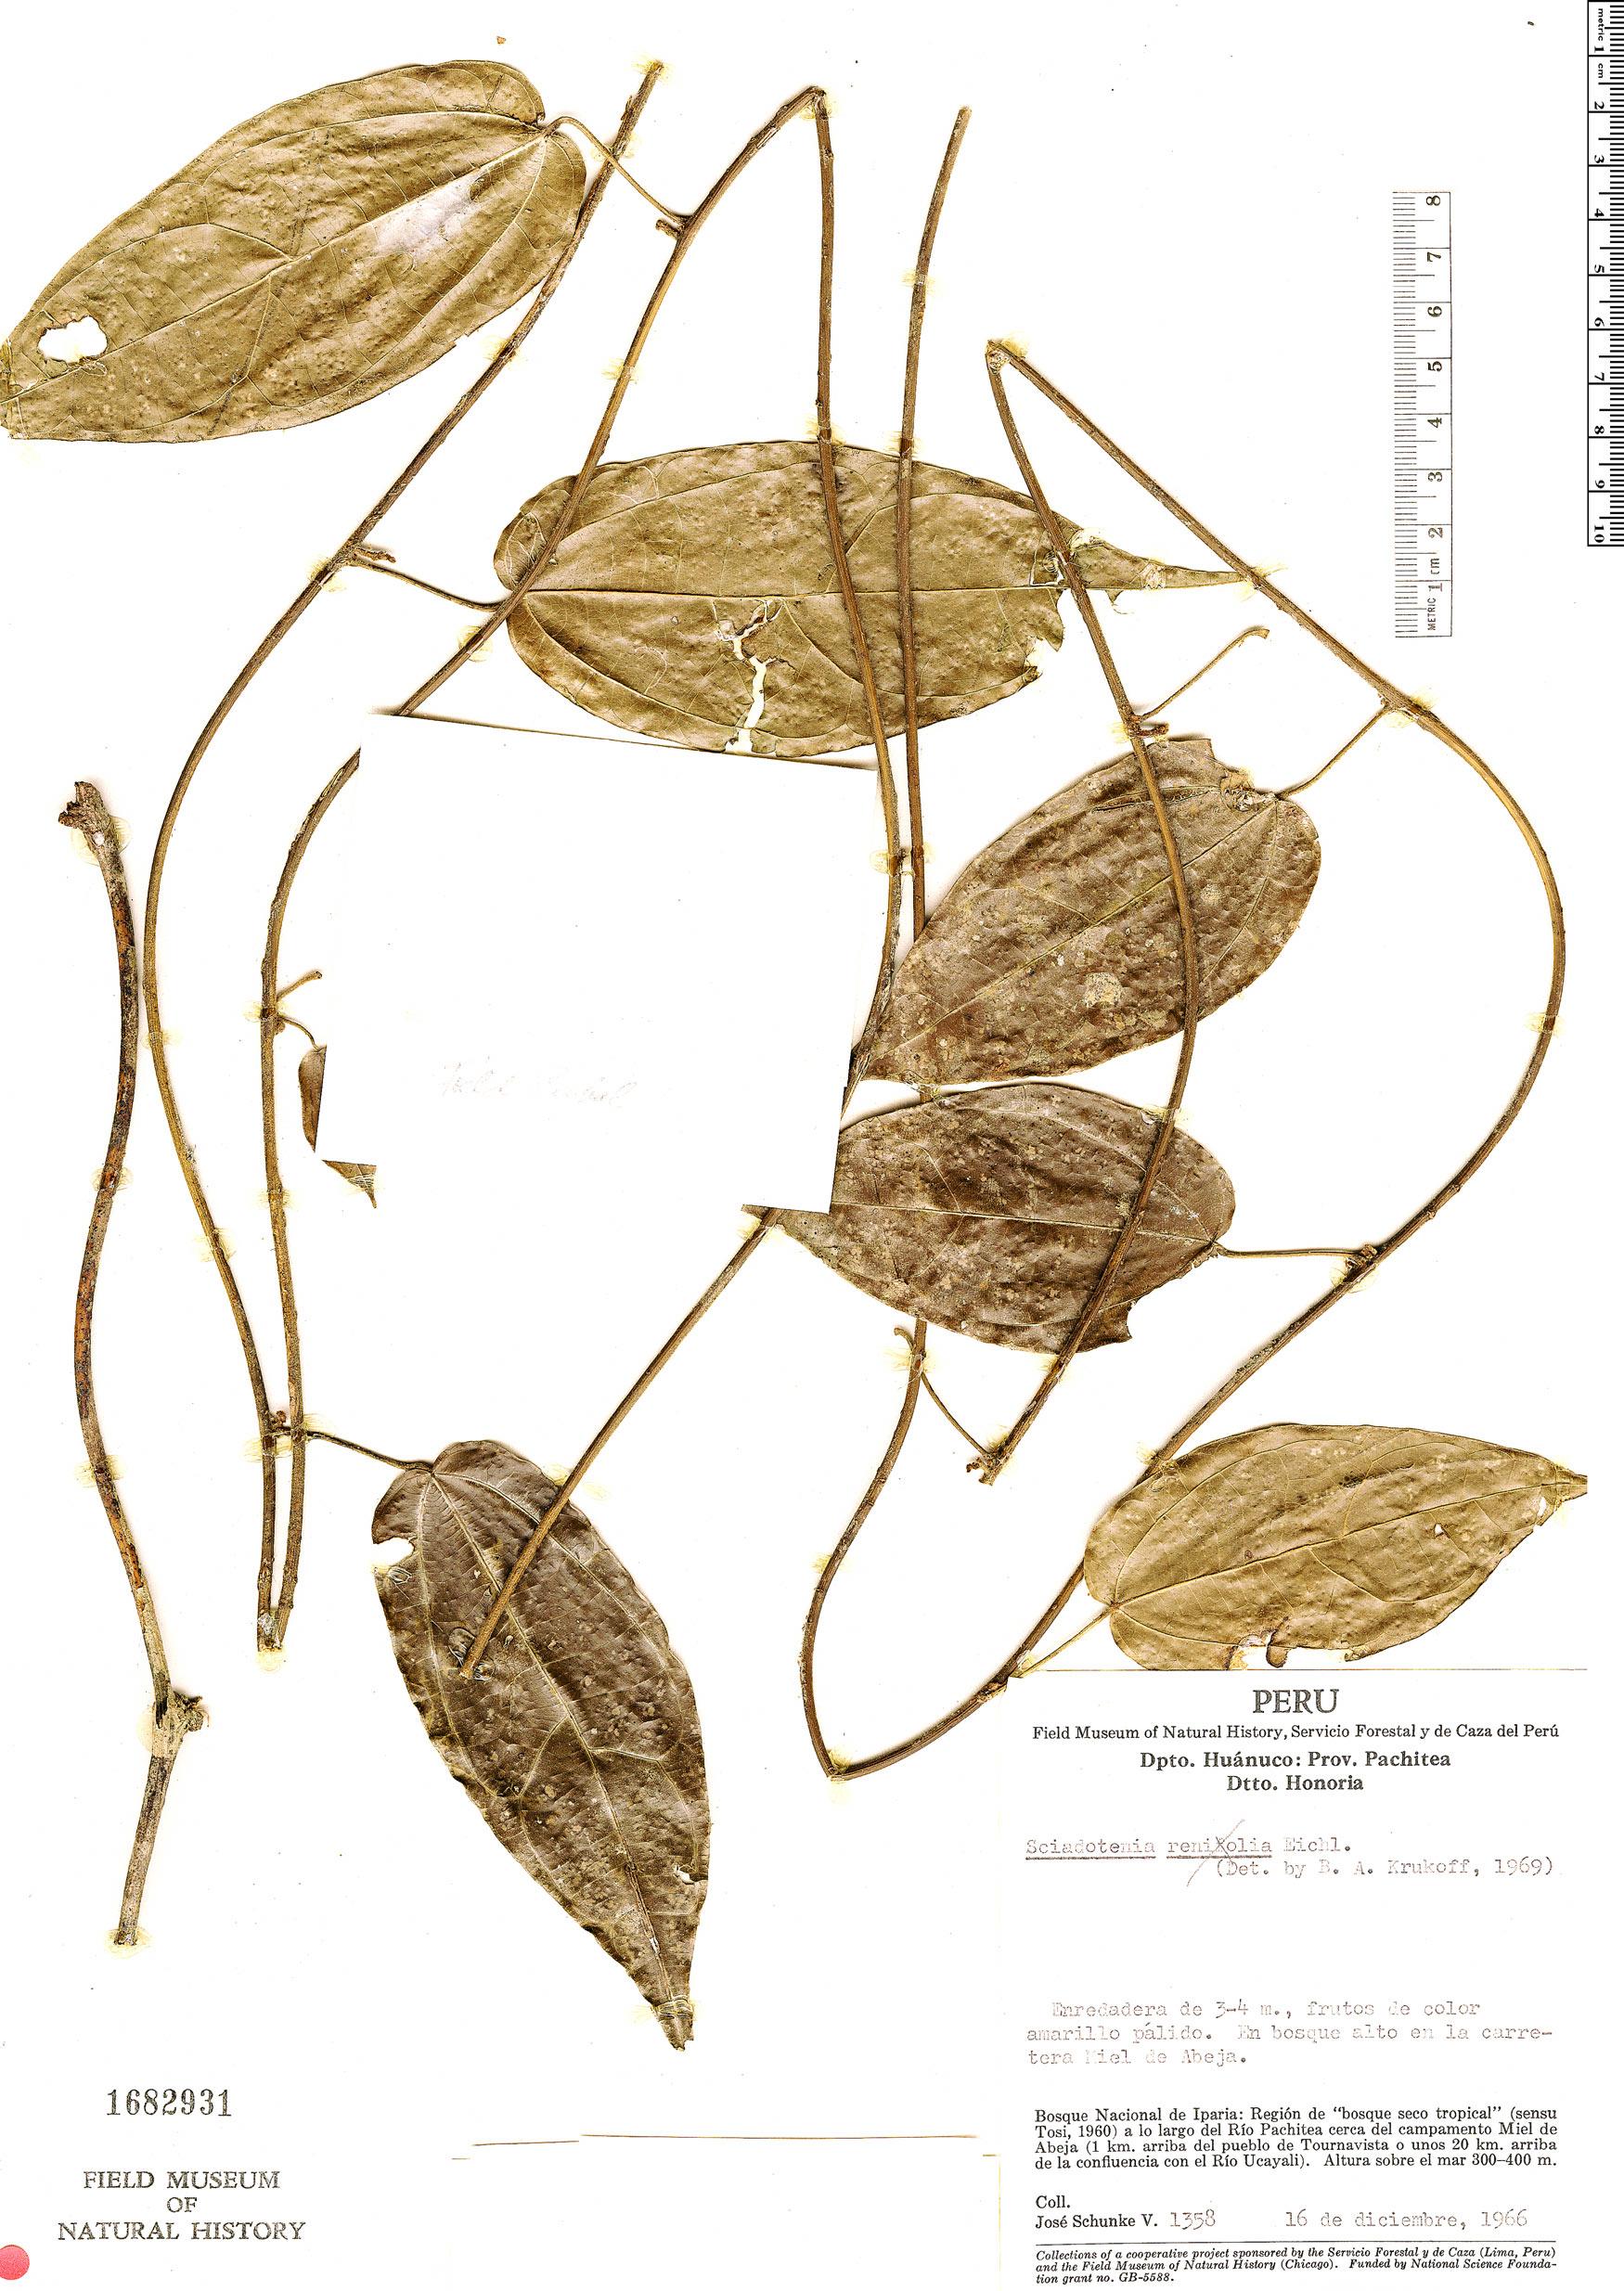 Specimen: Sciadotenia ramiflora